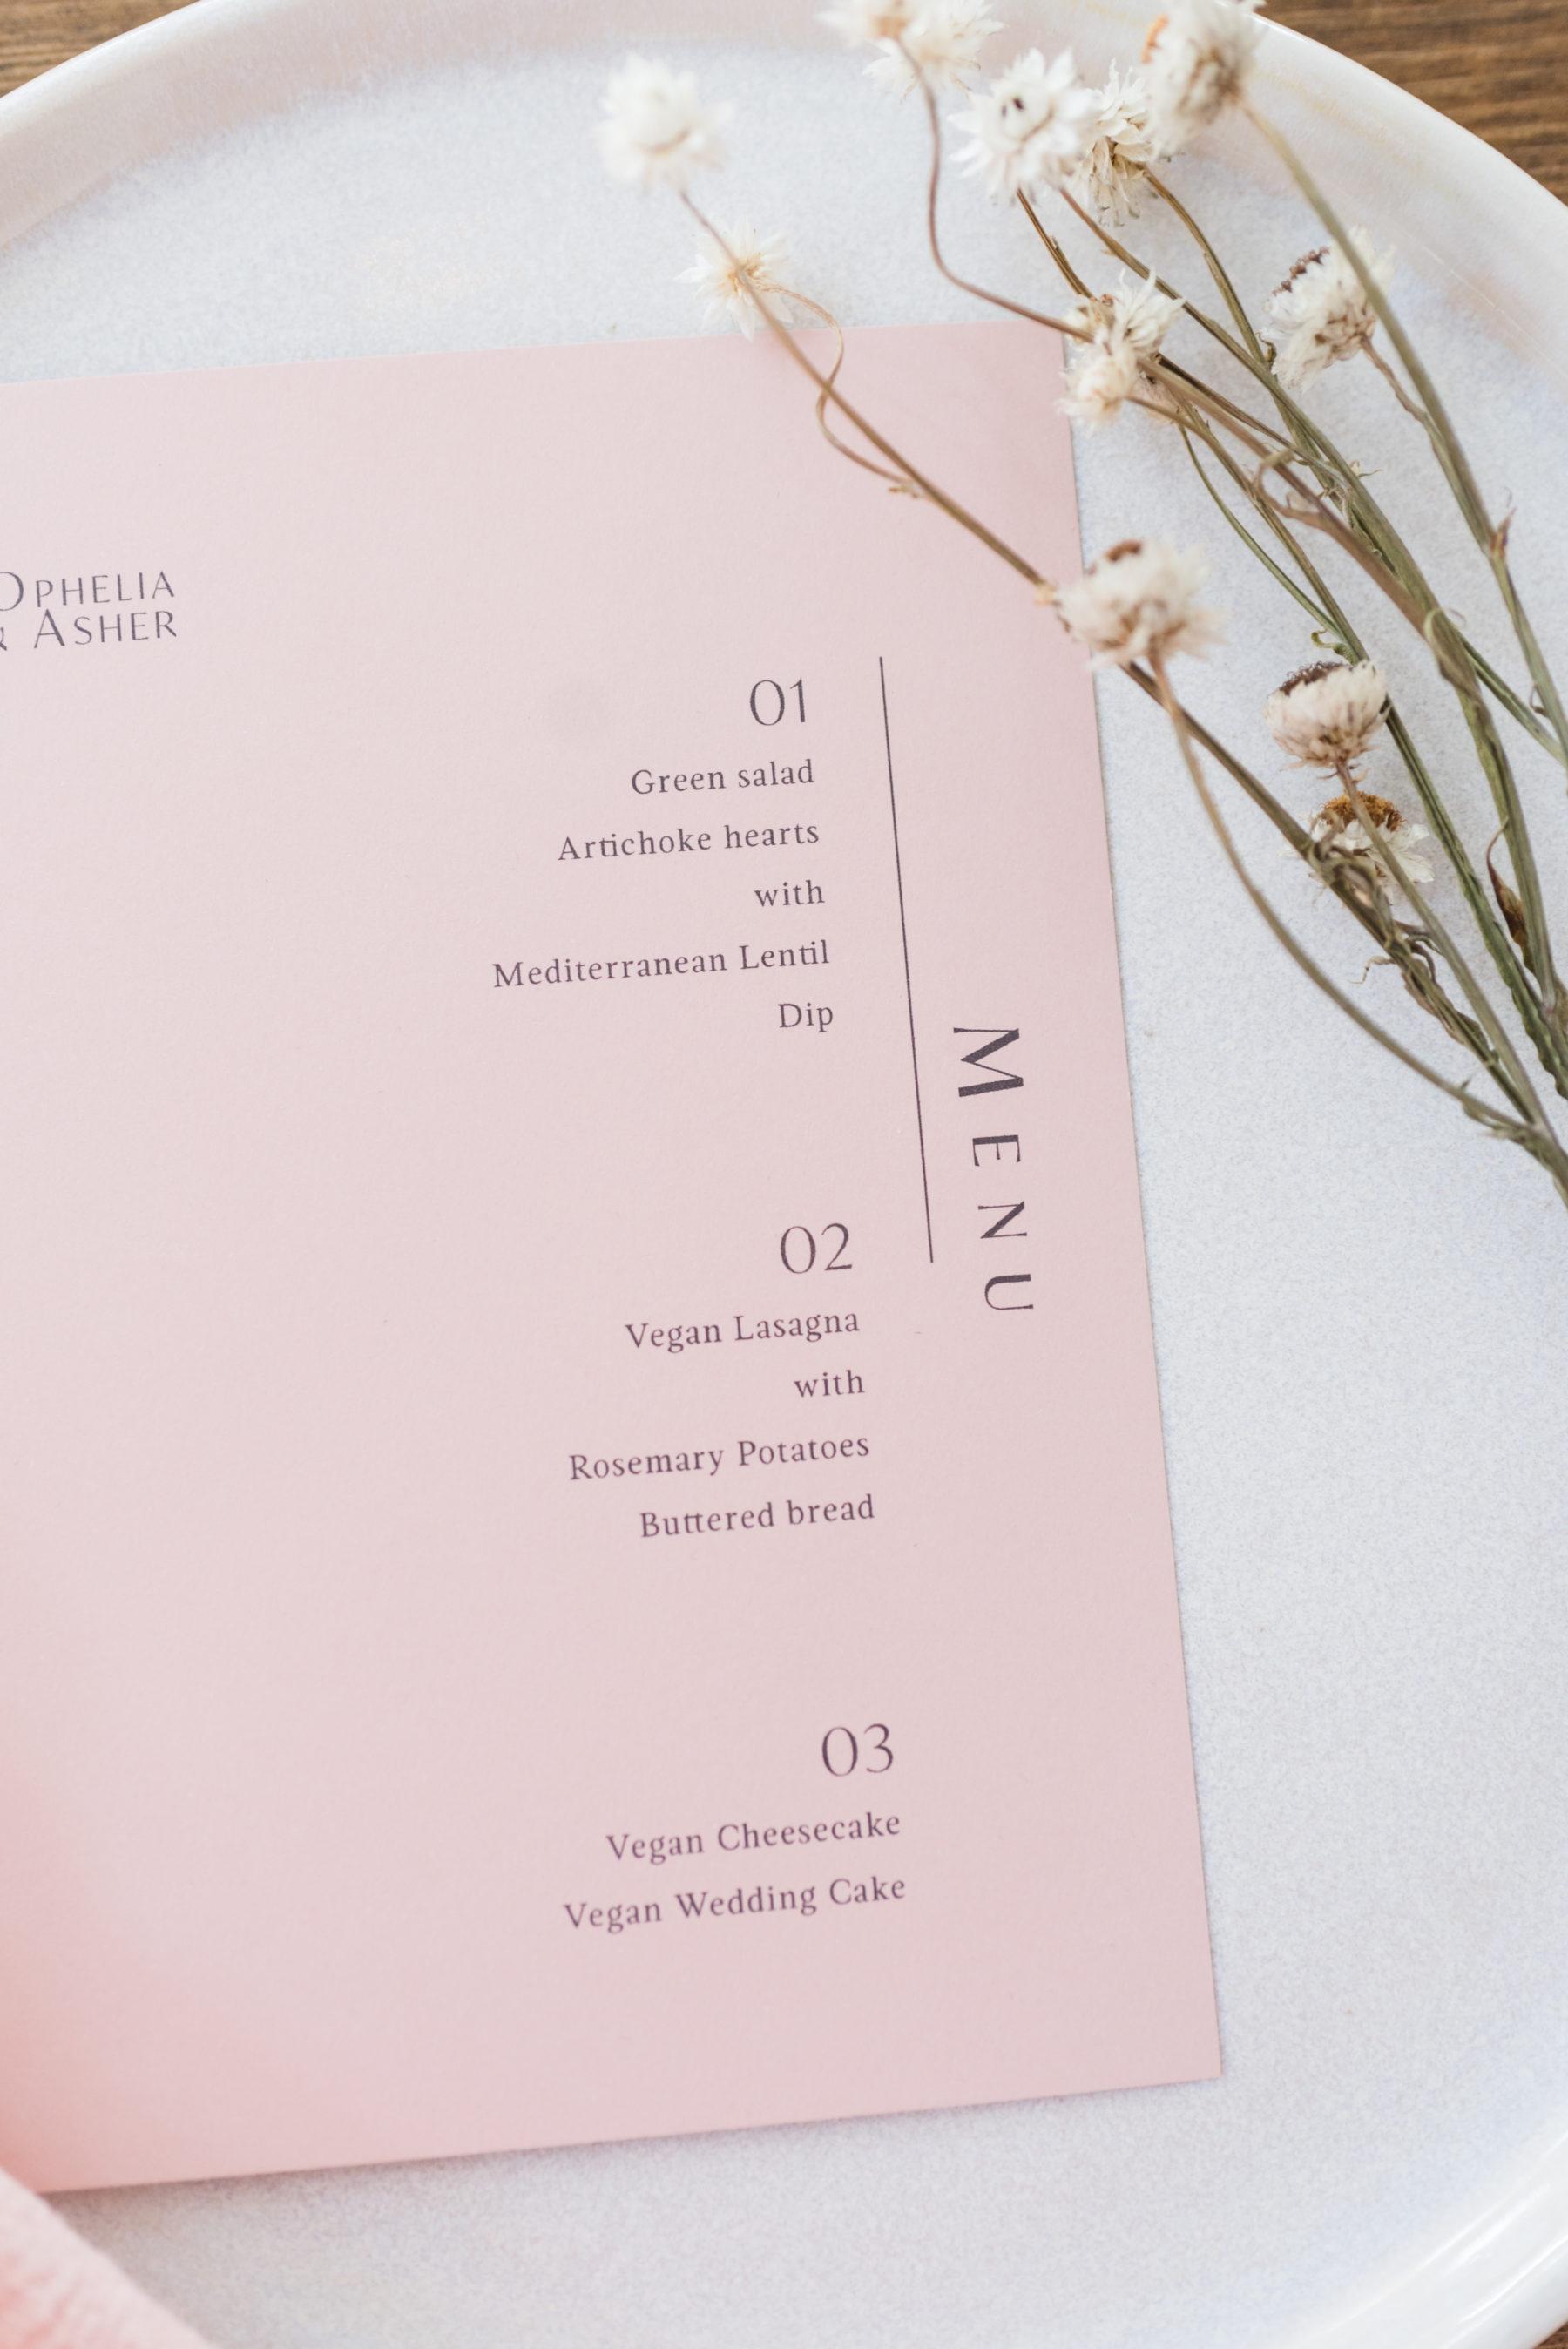 Blush Pink Wedding Stationery Design: Organic Eco-Friendly Wedding Styled Shoot featured on Nashville Bride Guide